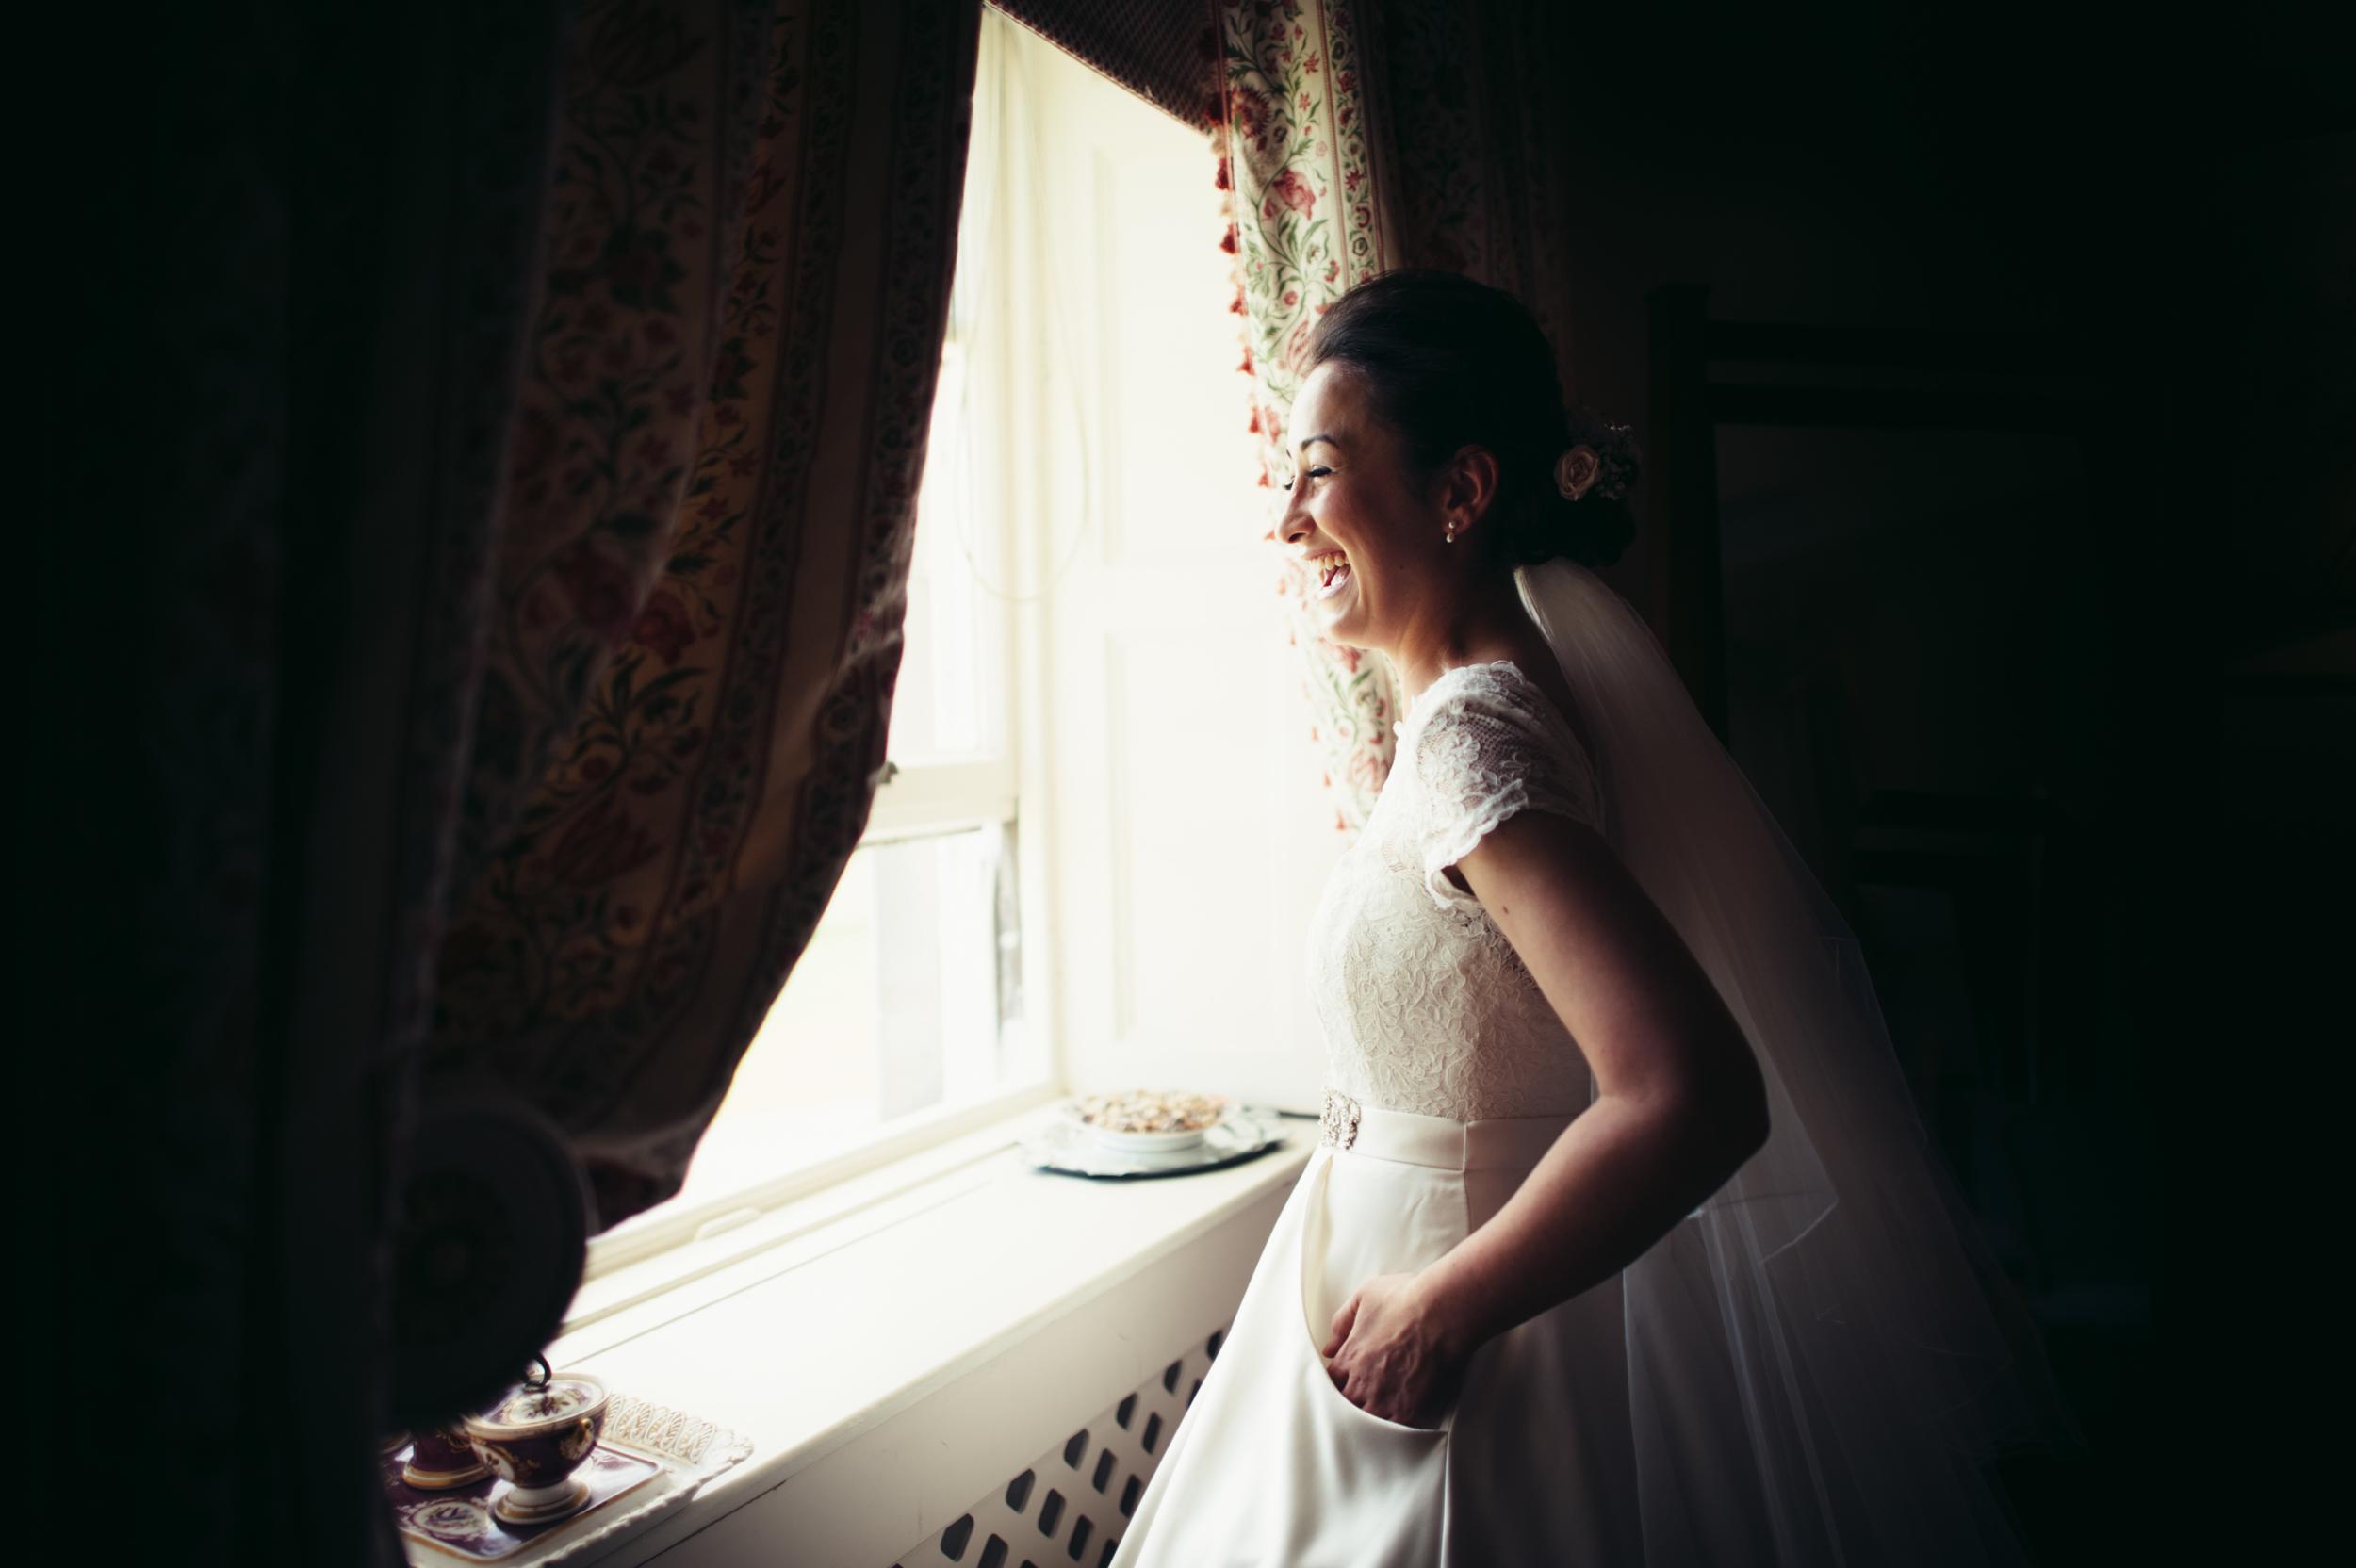 0079-lisa-devine-alternative-creative-wedding-photography-glasgow-edinburgh.JPG